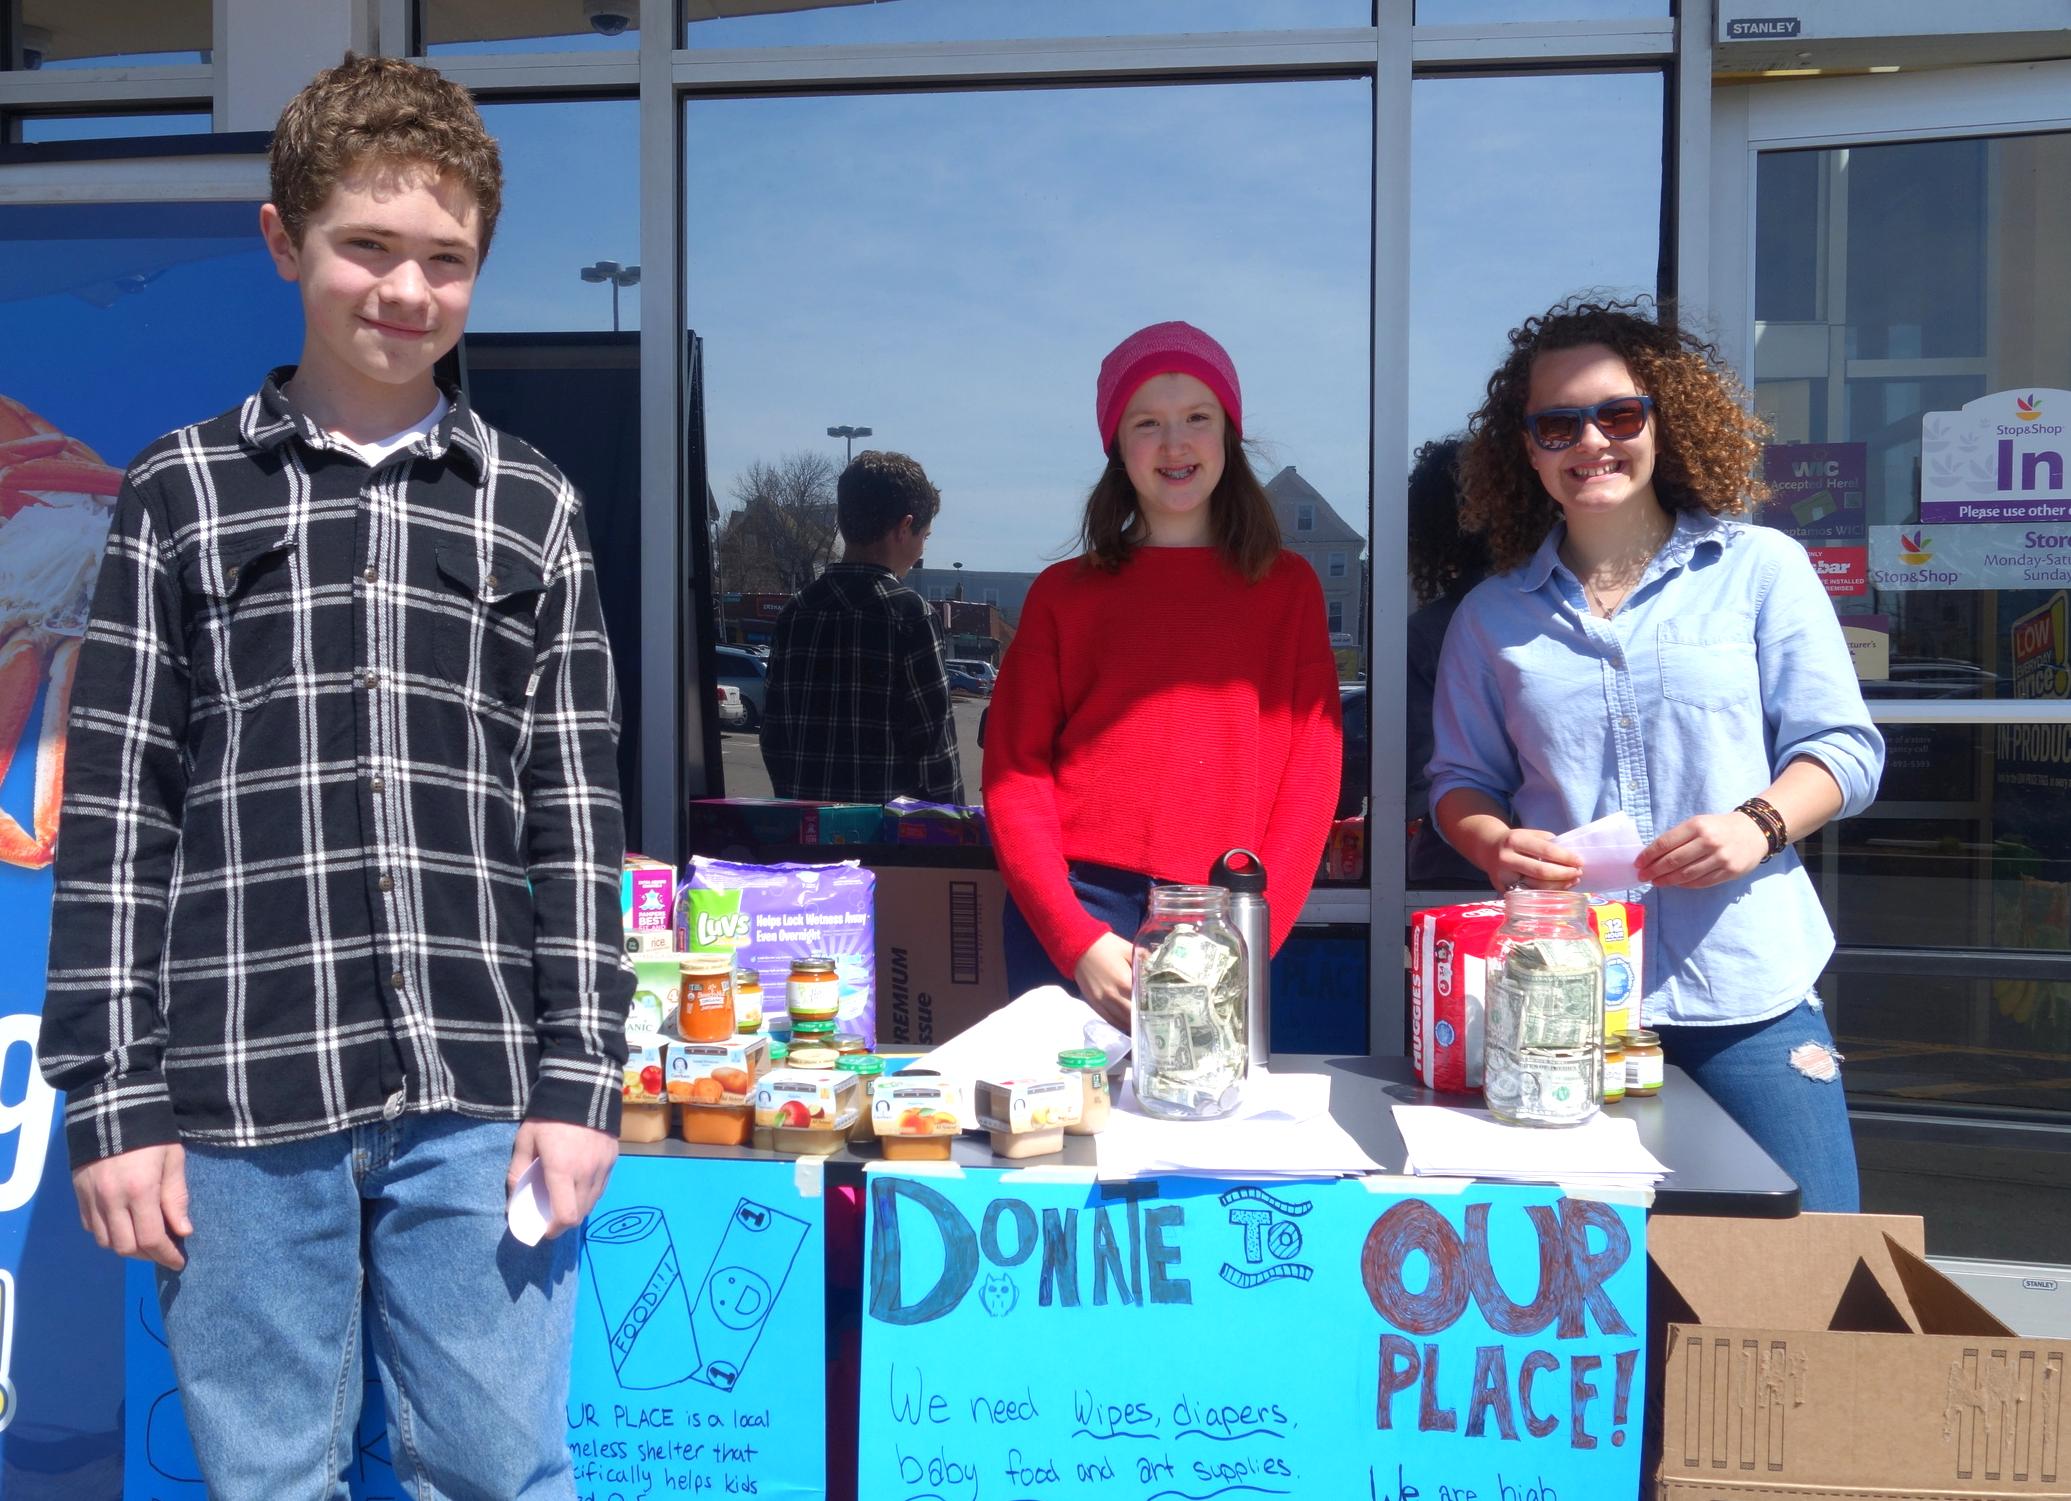 7th grader Jack, 6th grader Isabel, and 9th grader Izzy at the Supermarket Drive